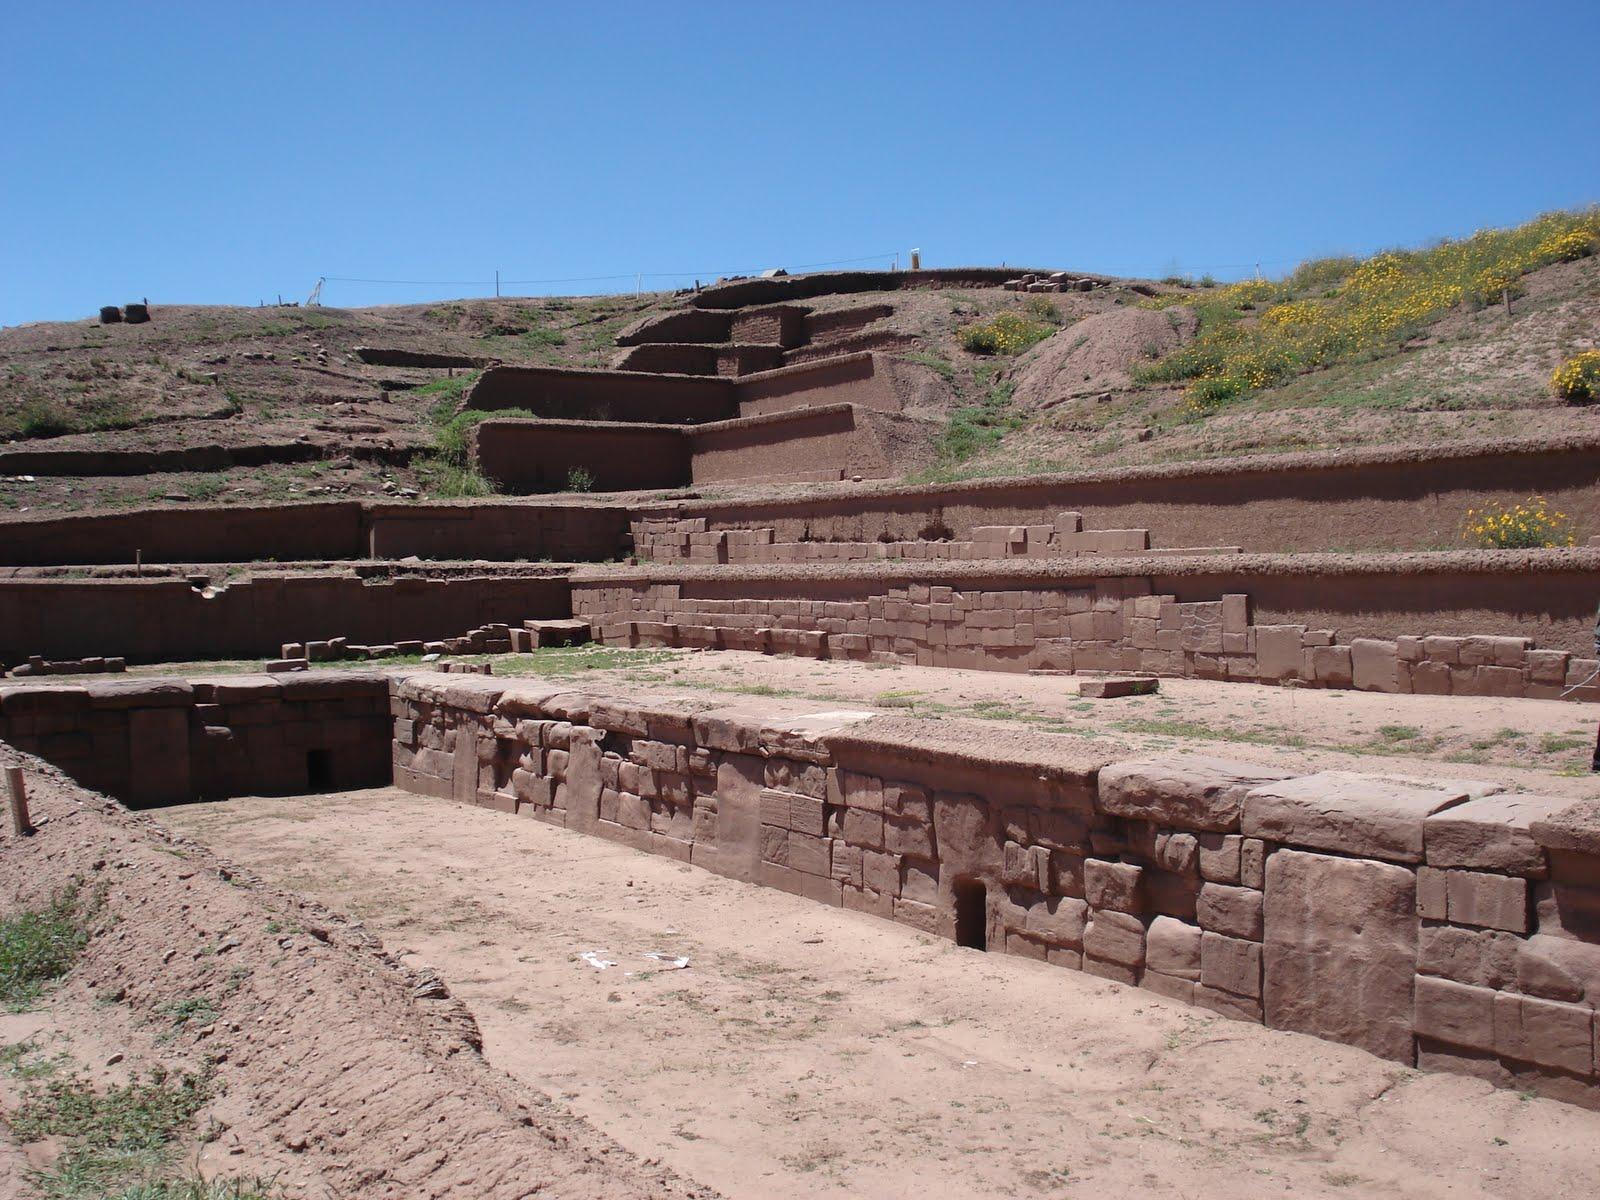 The Akapana Pyramid mound Ancient Mystery Pumapunku Tiwanaku Tiahuanaco